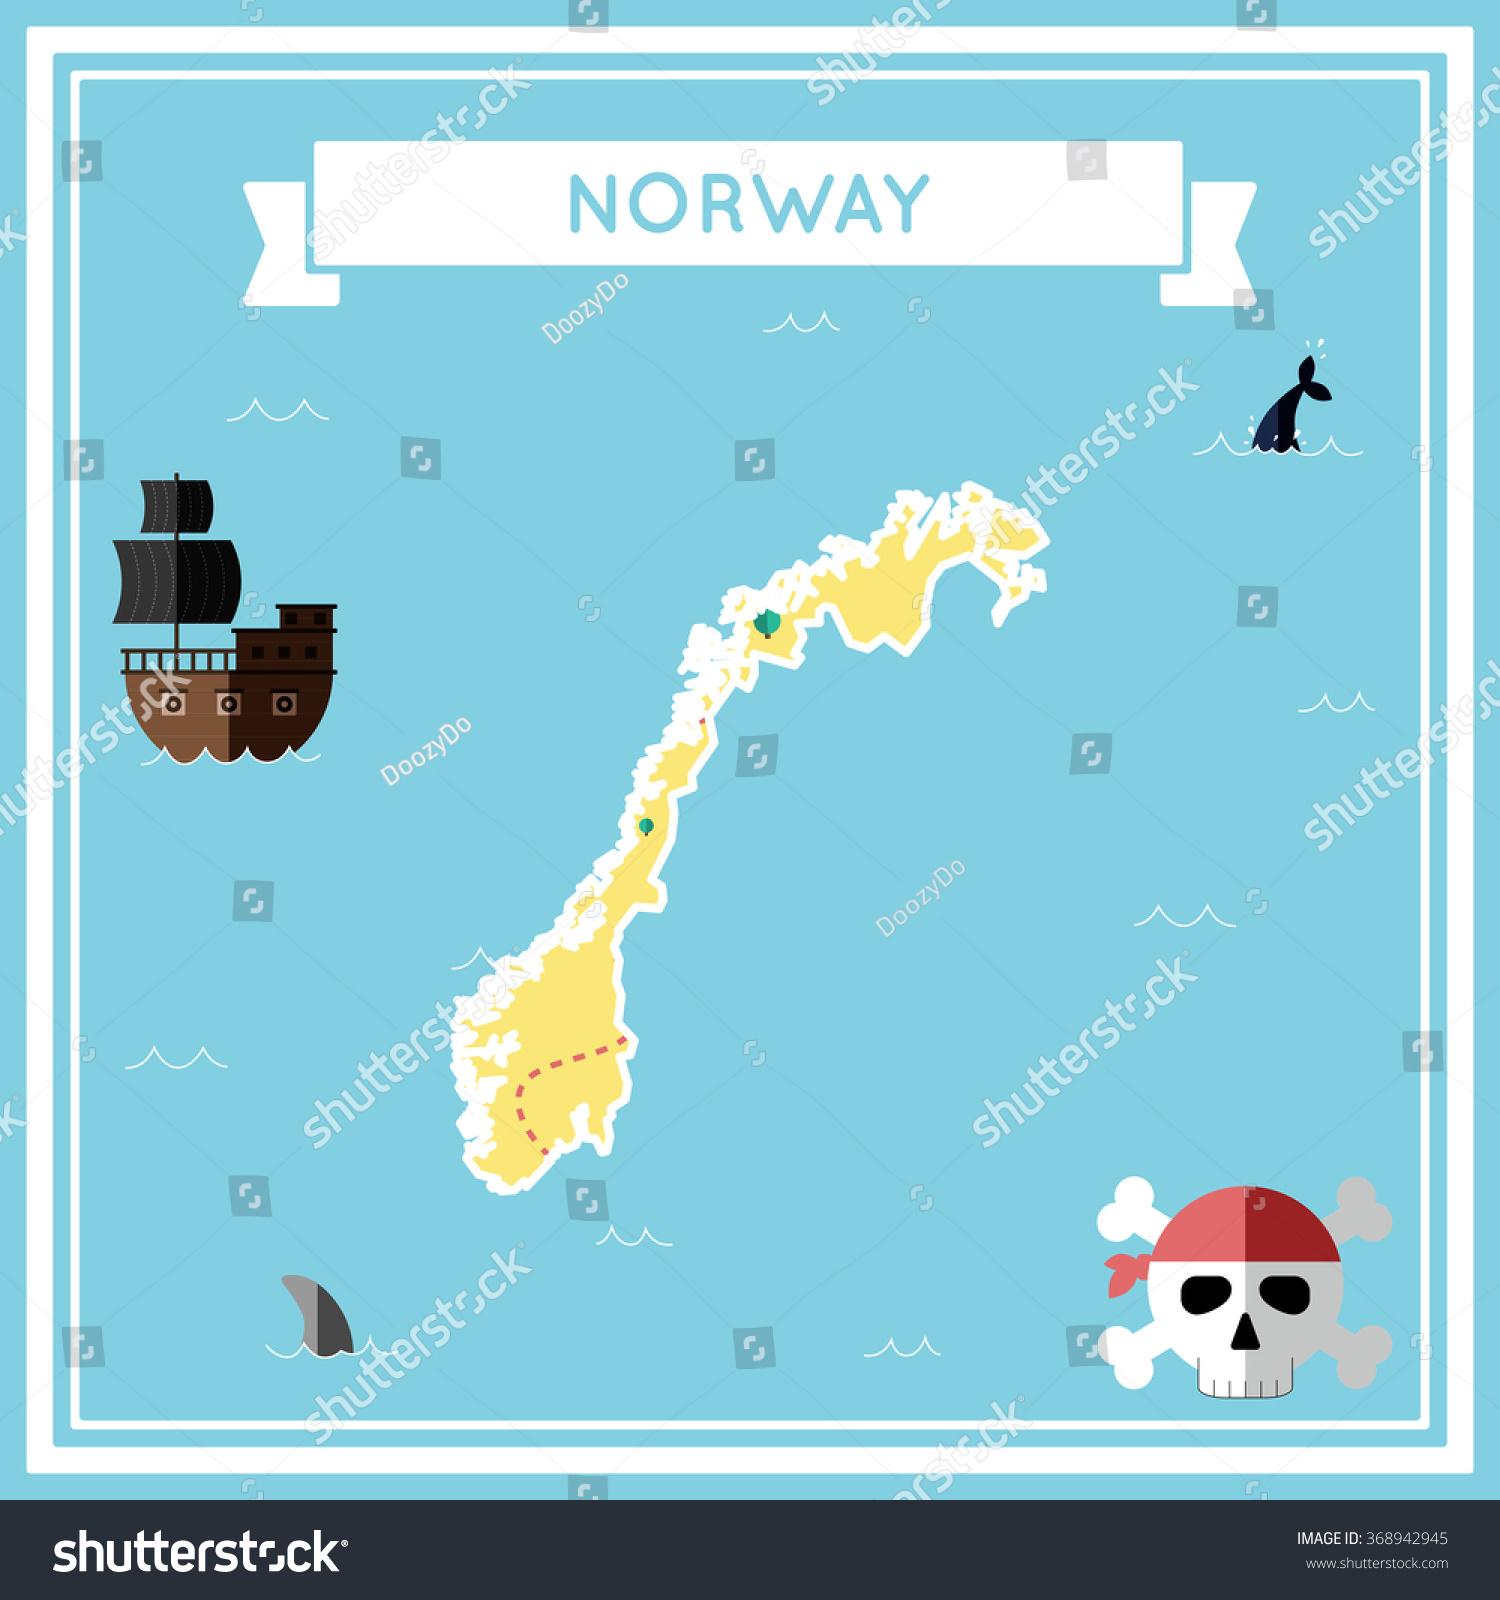 Norway Flat Treasure Map Colorful Cartoon Stock Vector - Norway map cartoon